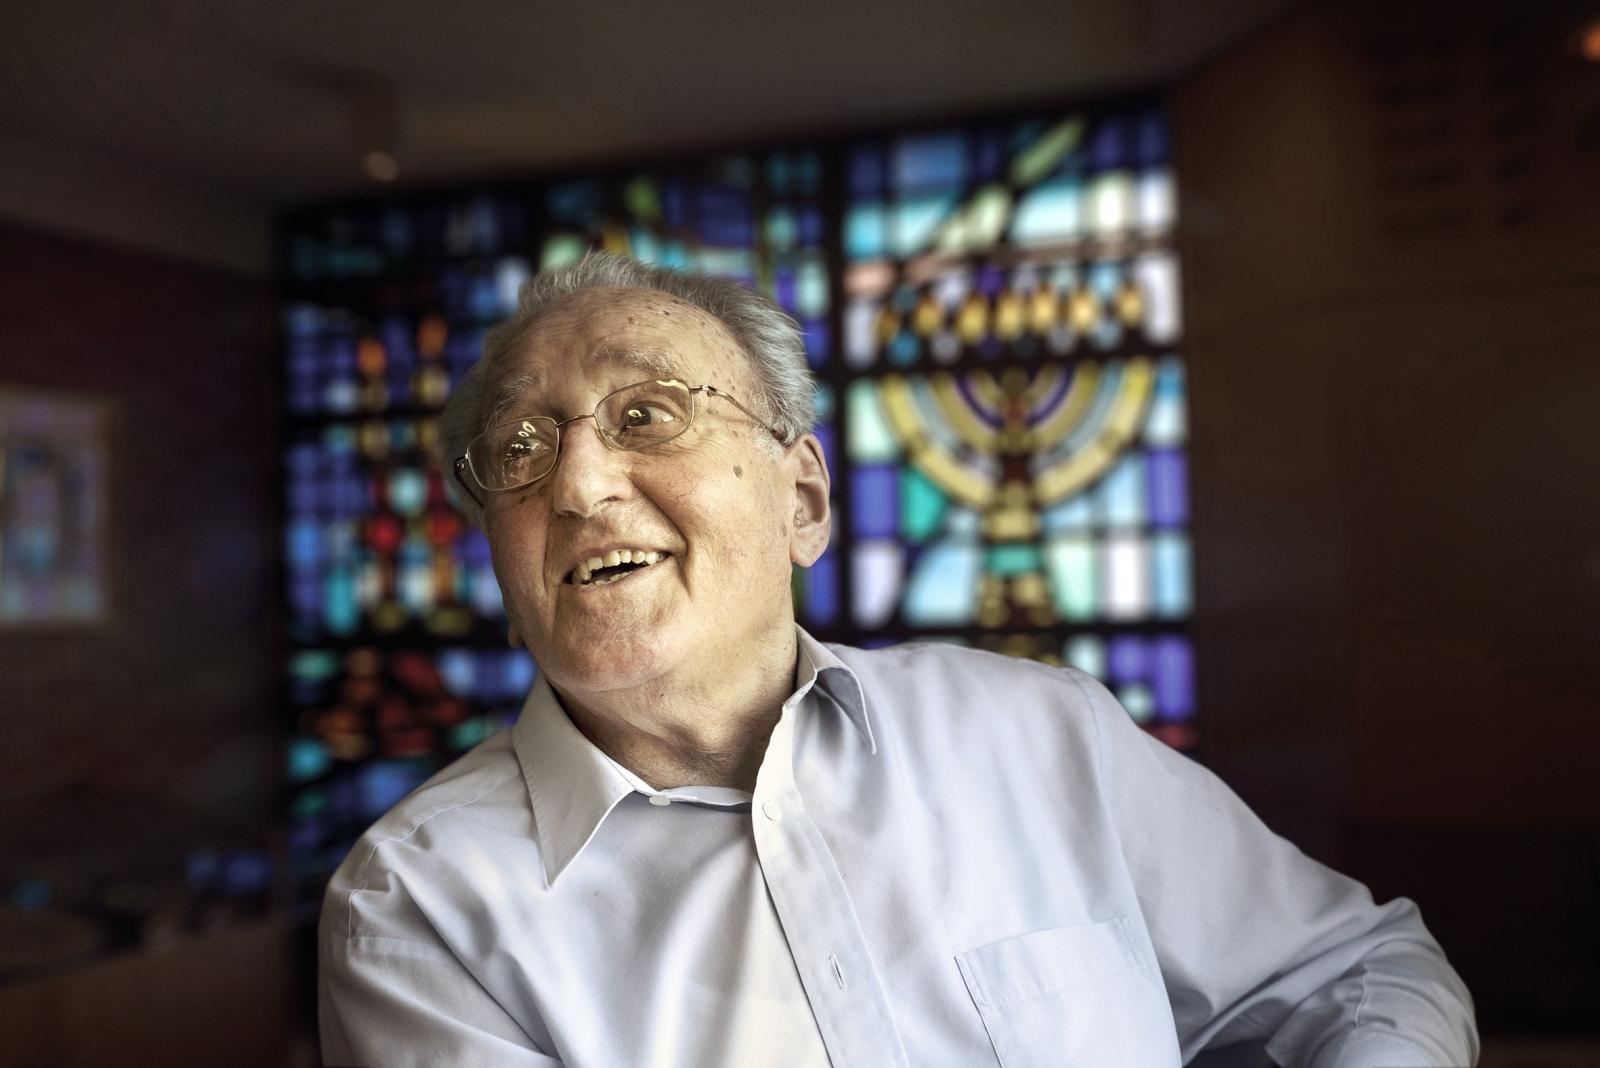 Ivor Perl Holocaust survivor